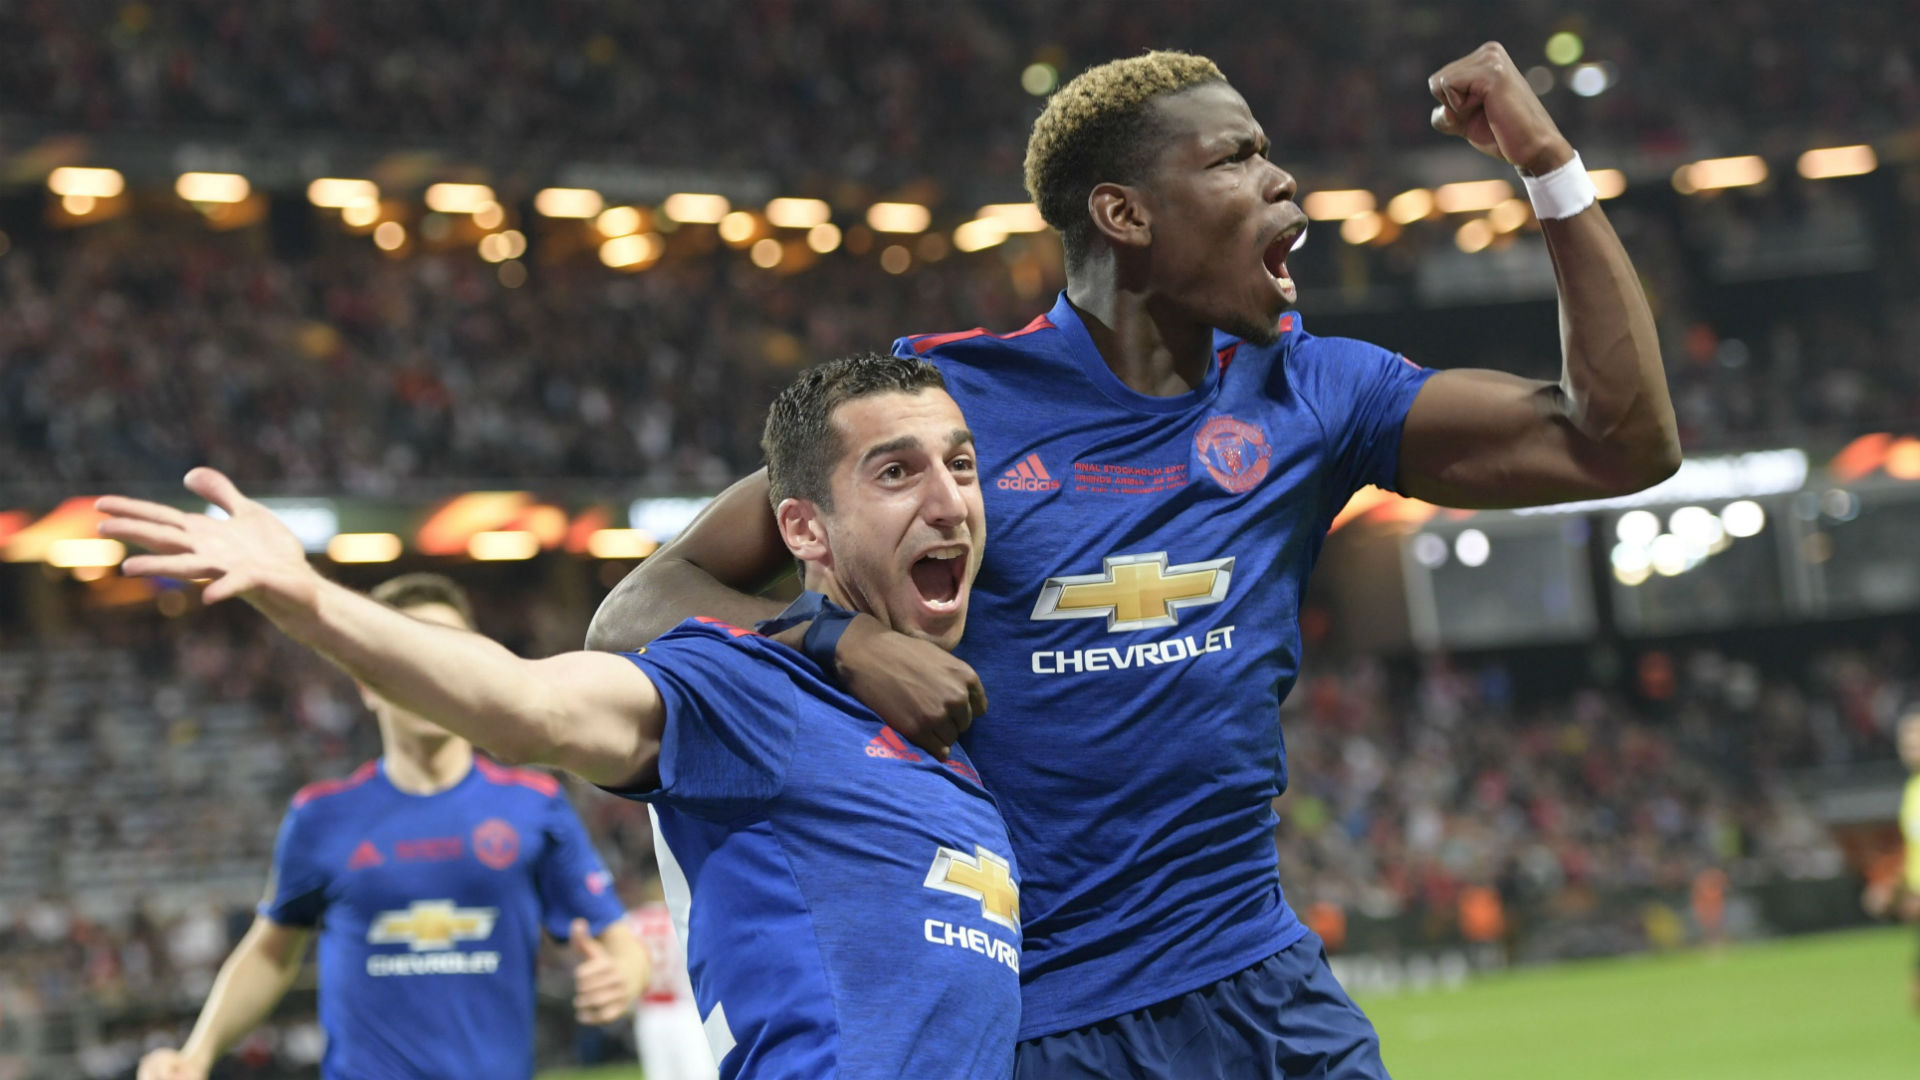 Henrikh Mkhitaryan Paul Pogba Manchester United Europa League Final